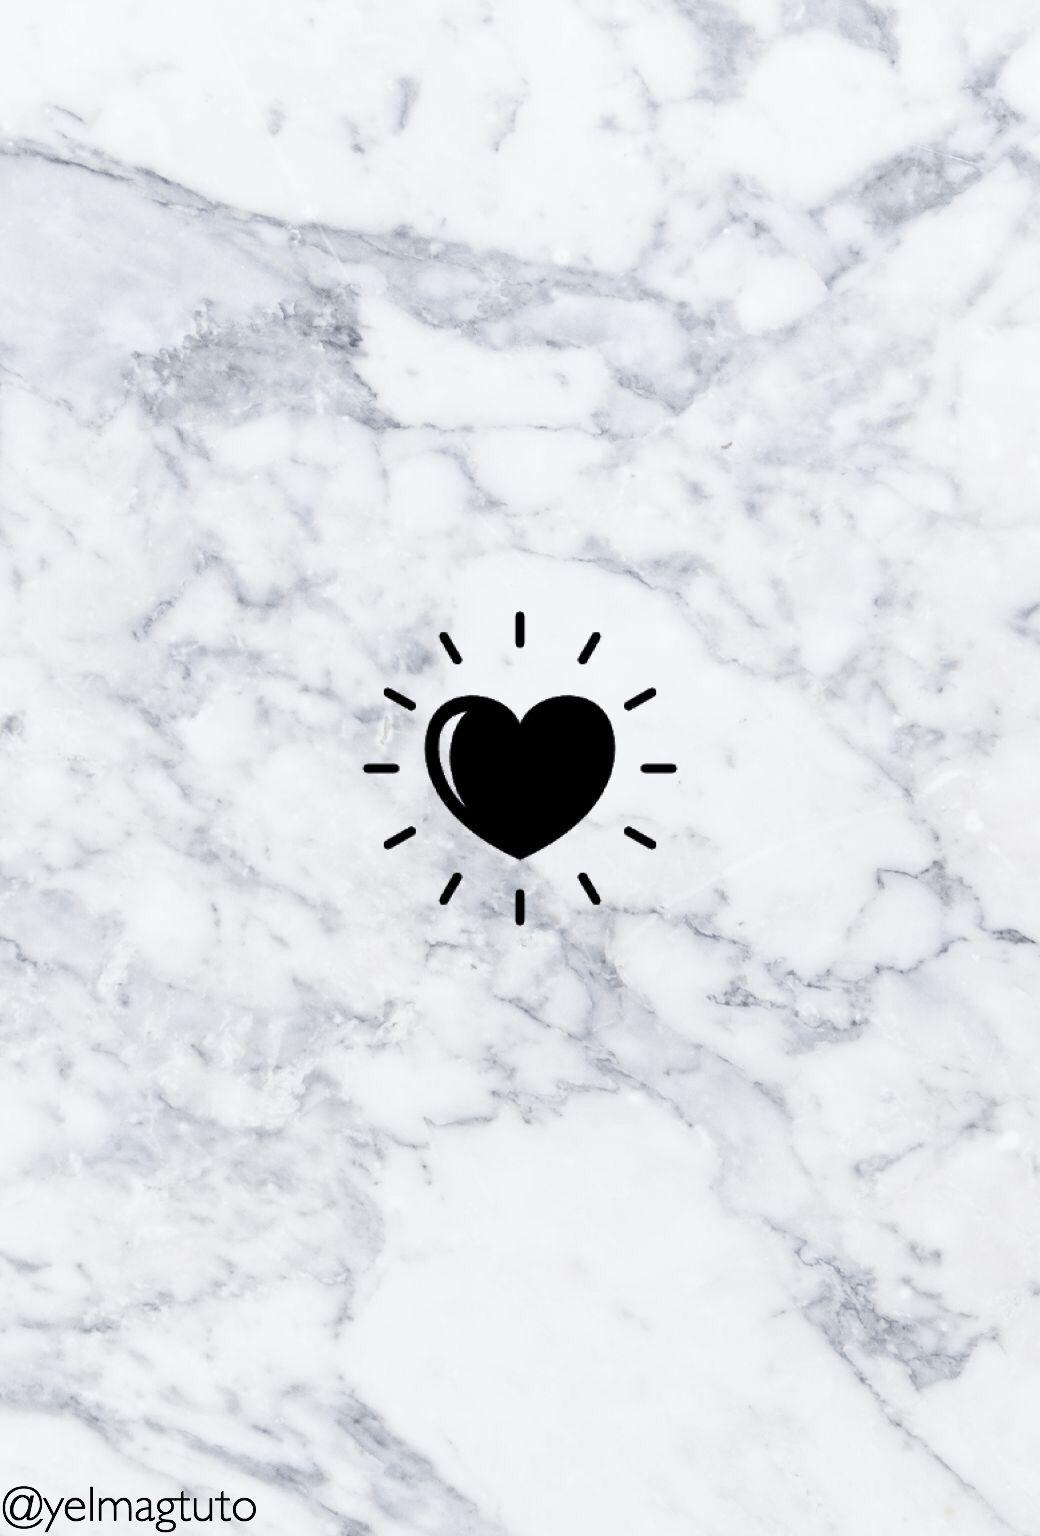 #highlights #instagram #ighighlights #marble #highlightsinstagram #highlights #instagram #ighighlights #marble #highlightsinstagram